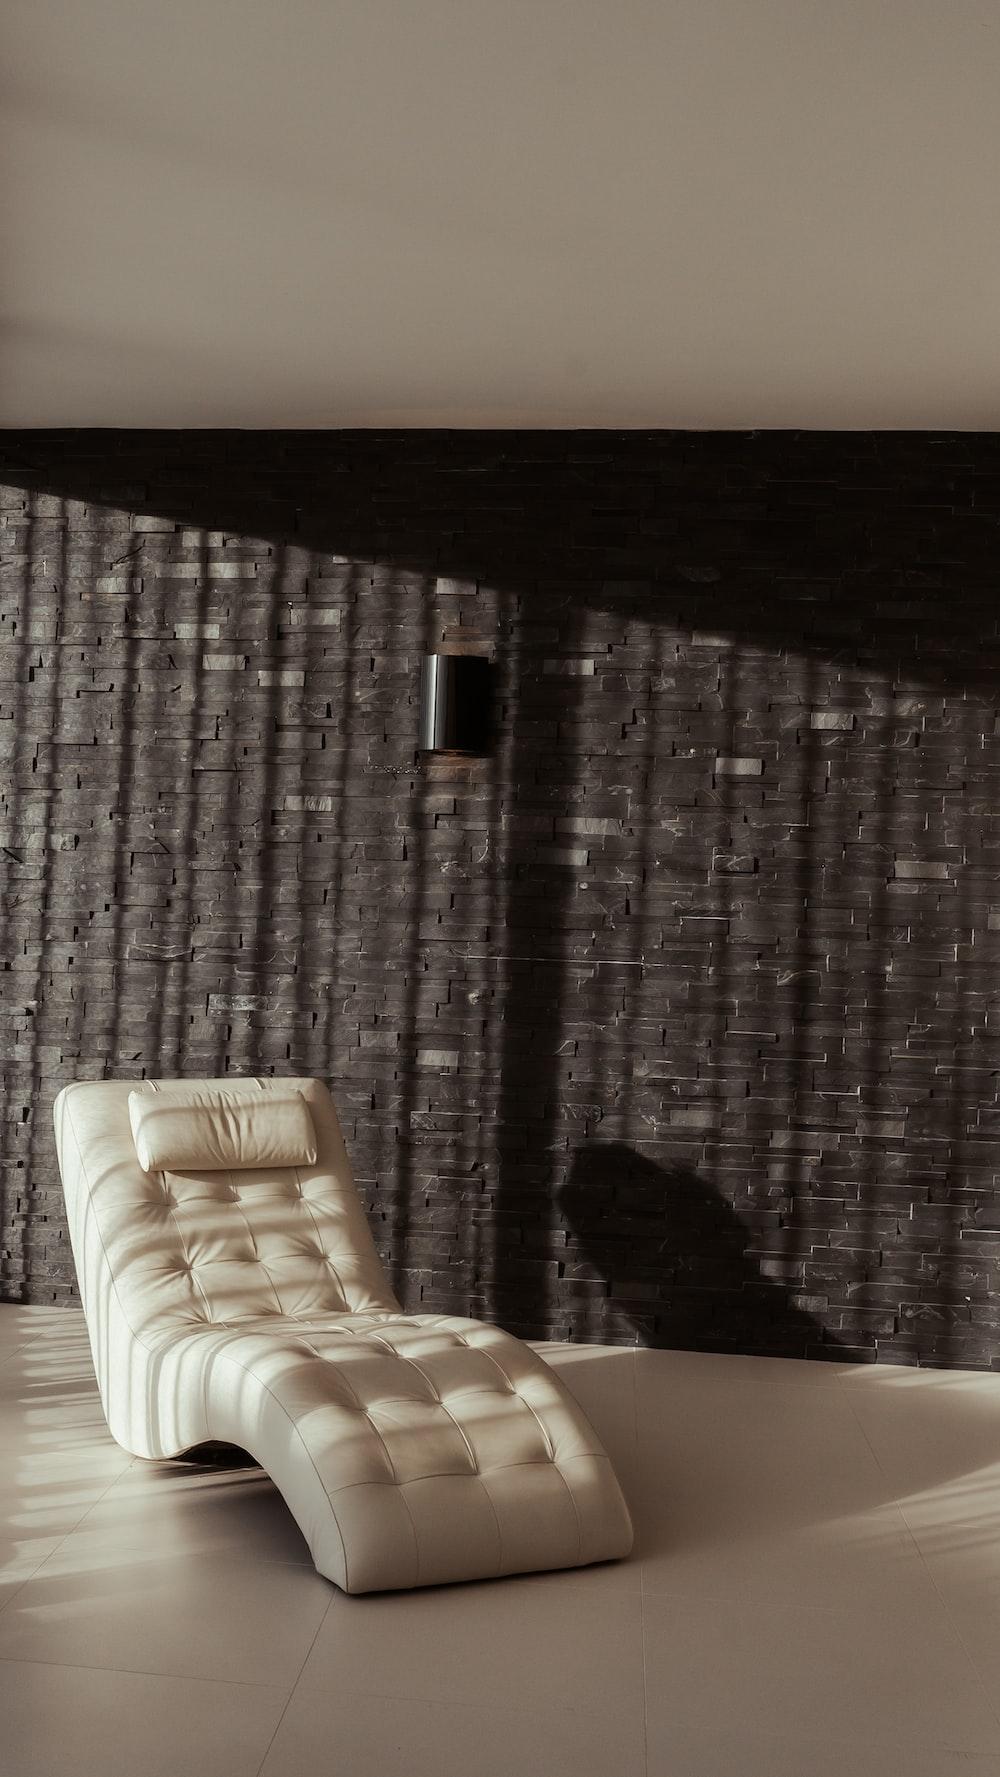 white and brown sofa near brown curtain